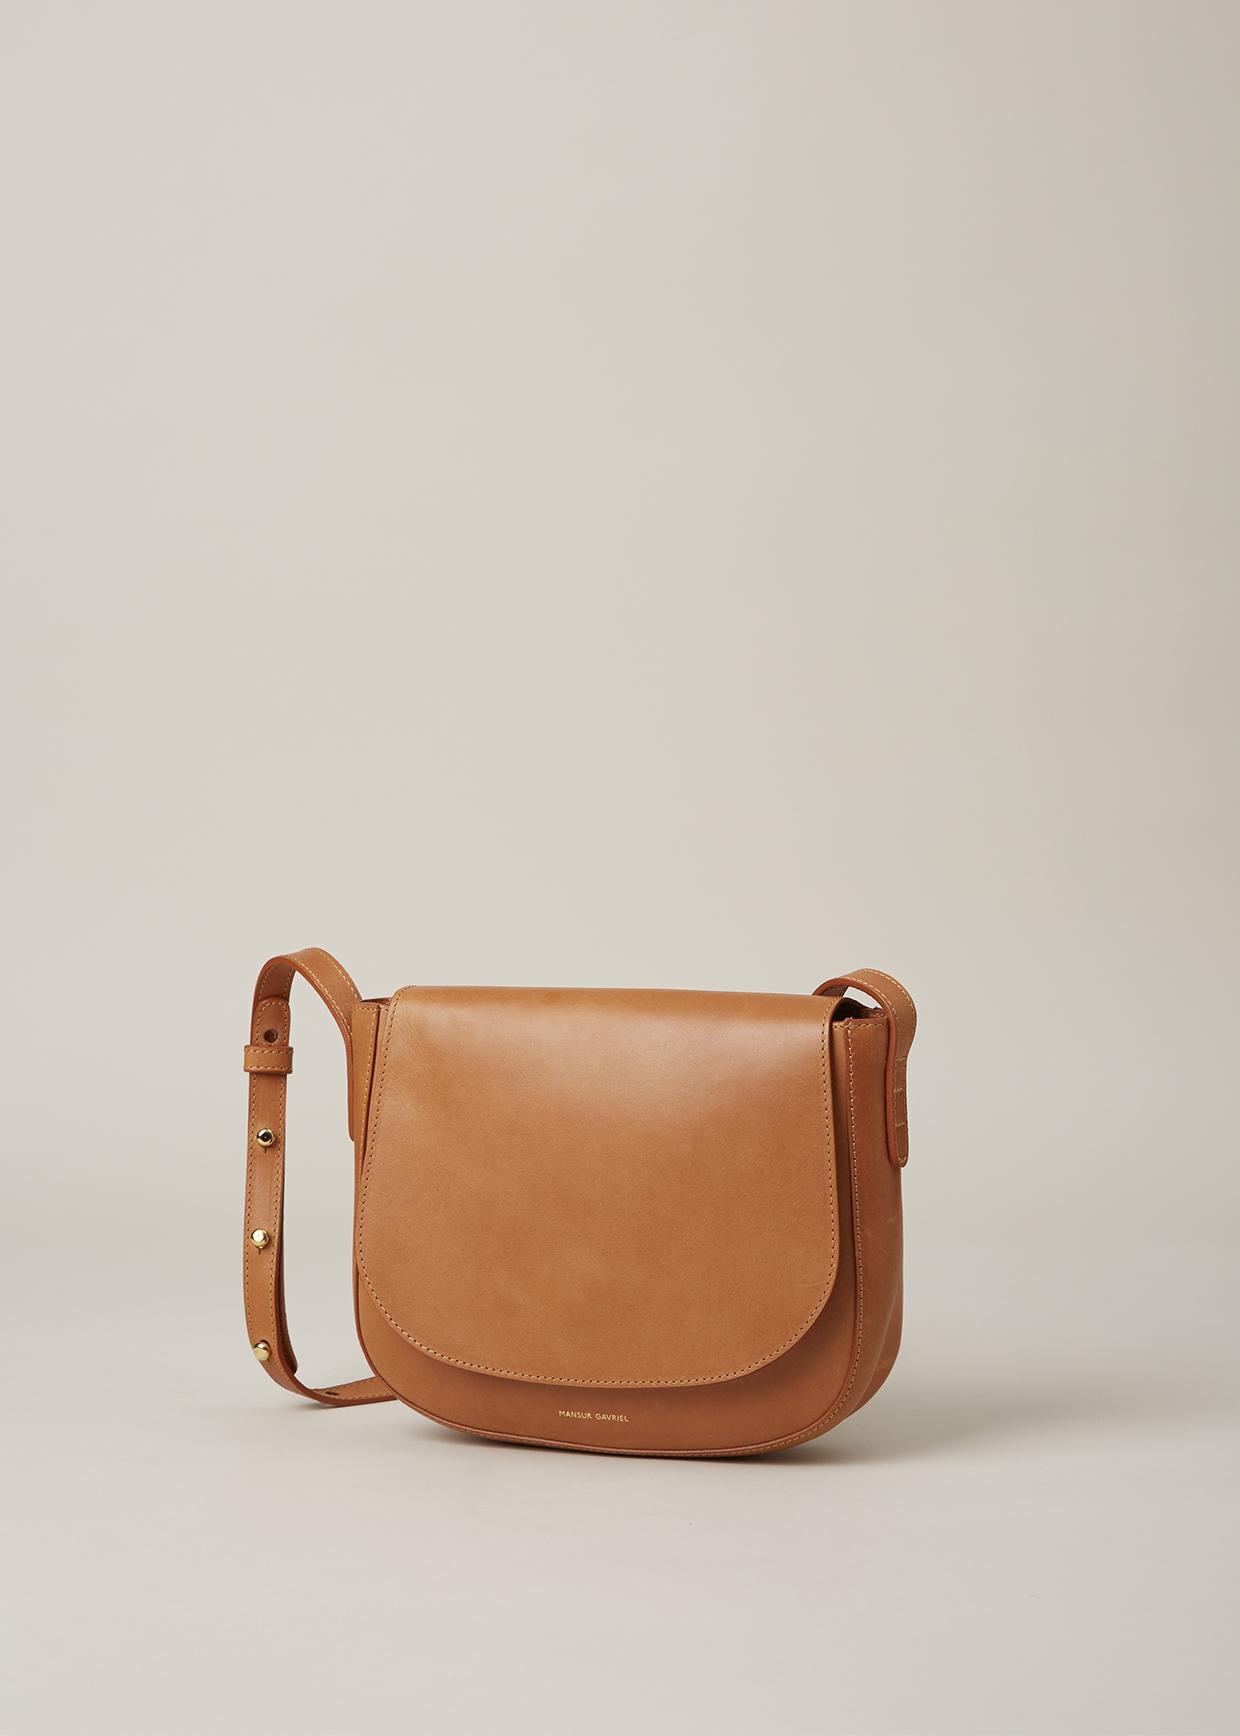 861529833c33 Lyst - Mansur Gavriel Cammello raw Crossbody Bag in Brown